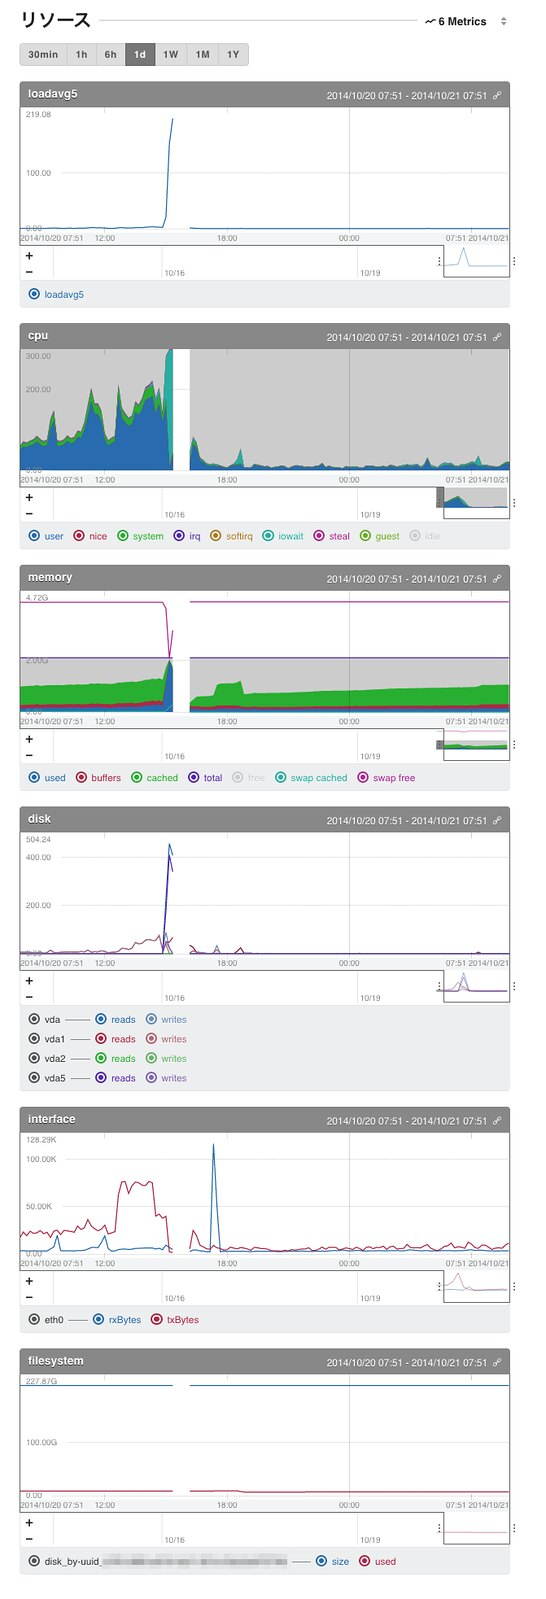 tdiary3 server metrics